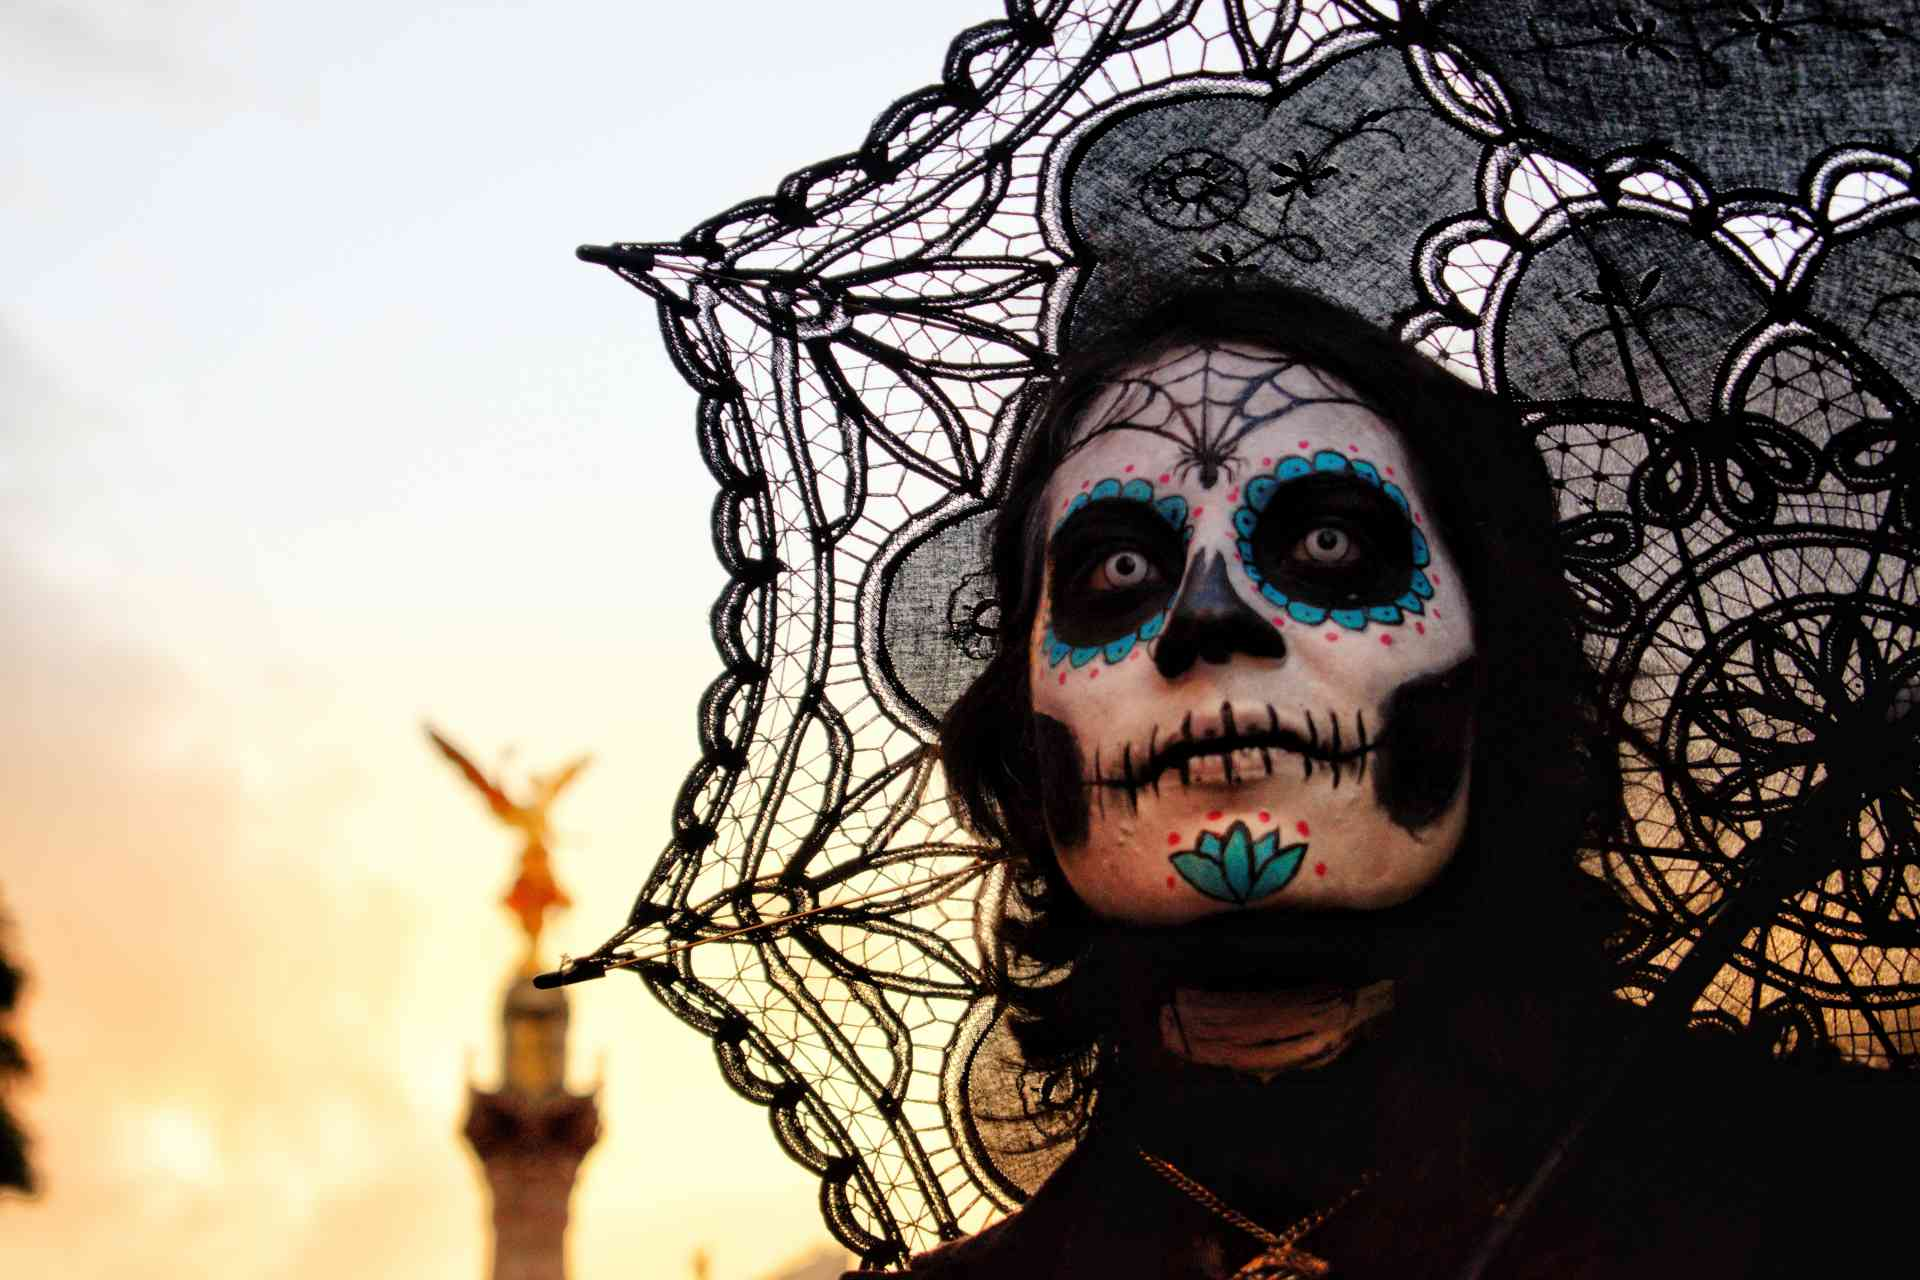 Day of the Dead Festival, Mexico by Salvador Altamirano/Unsplash